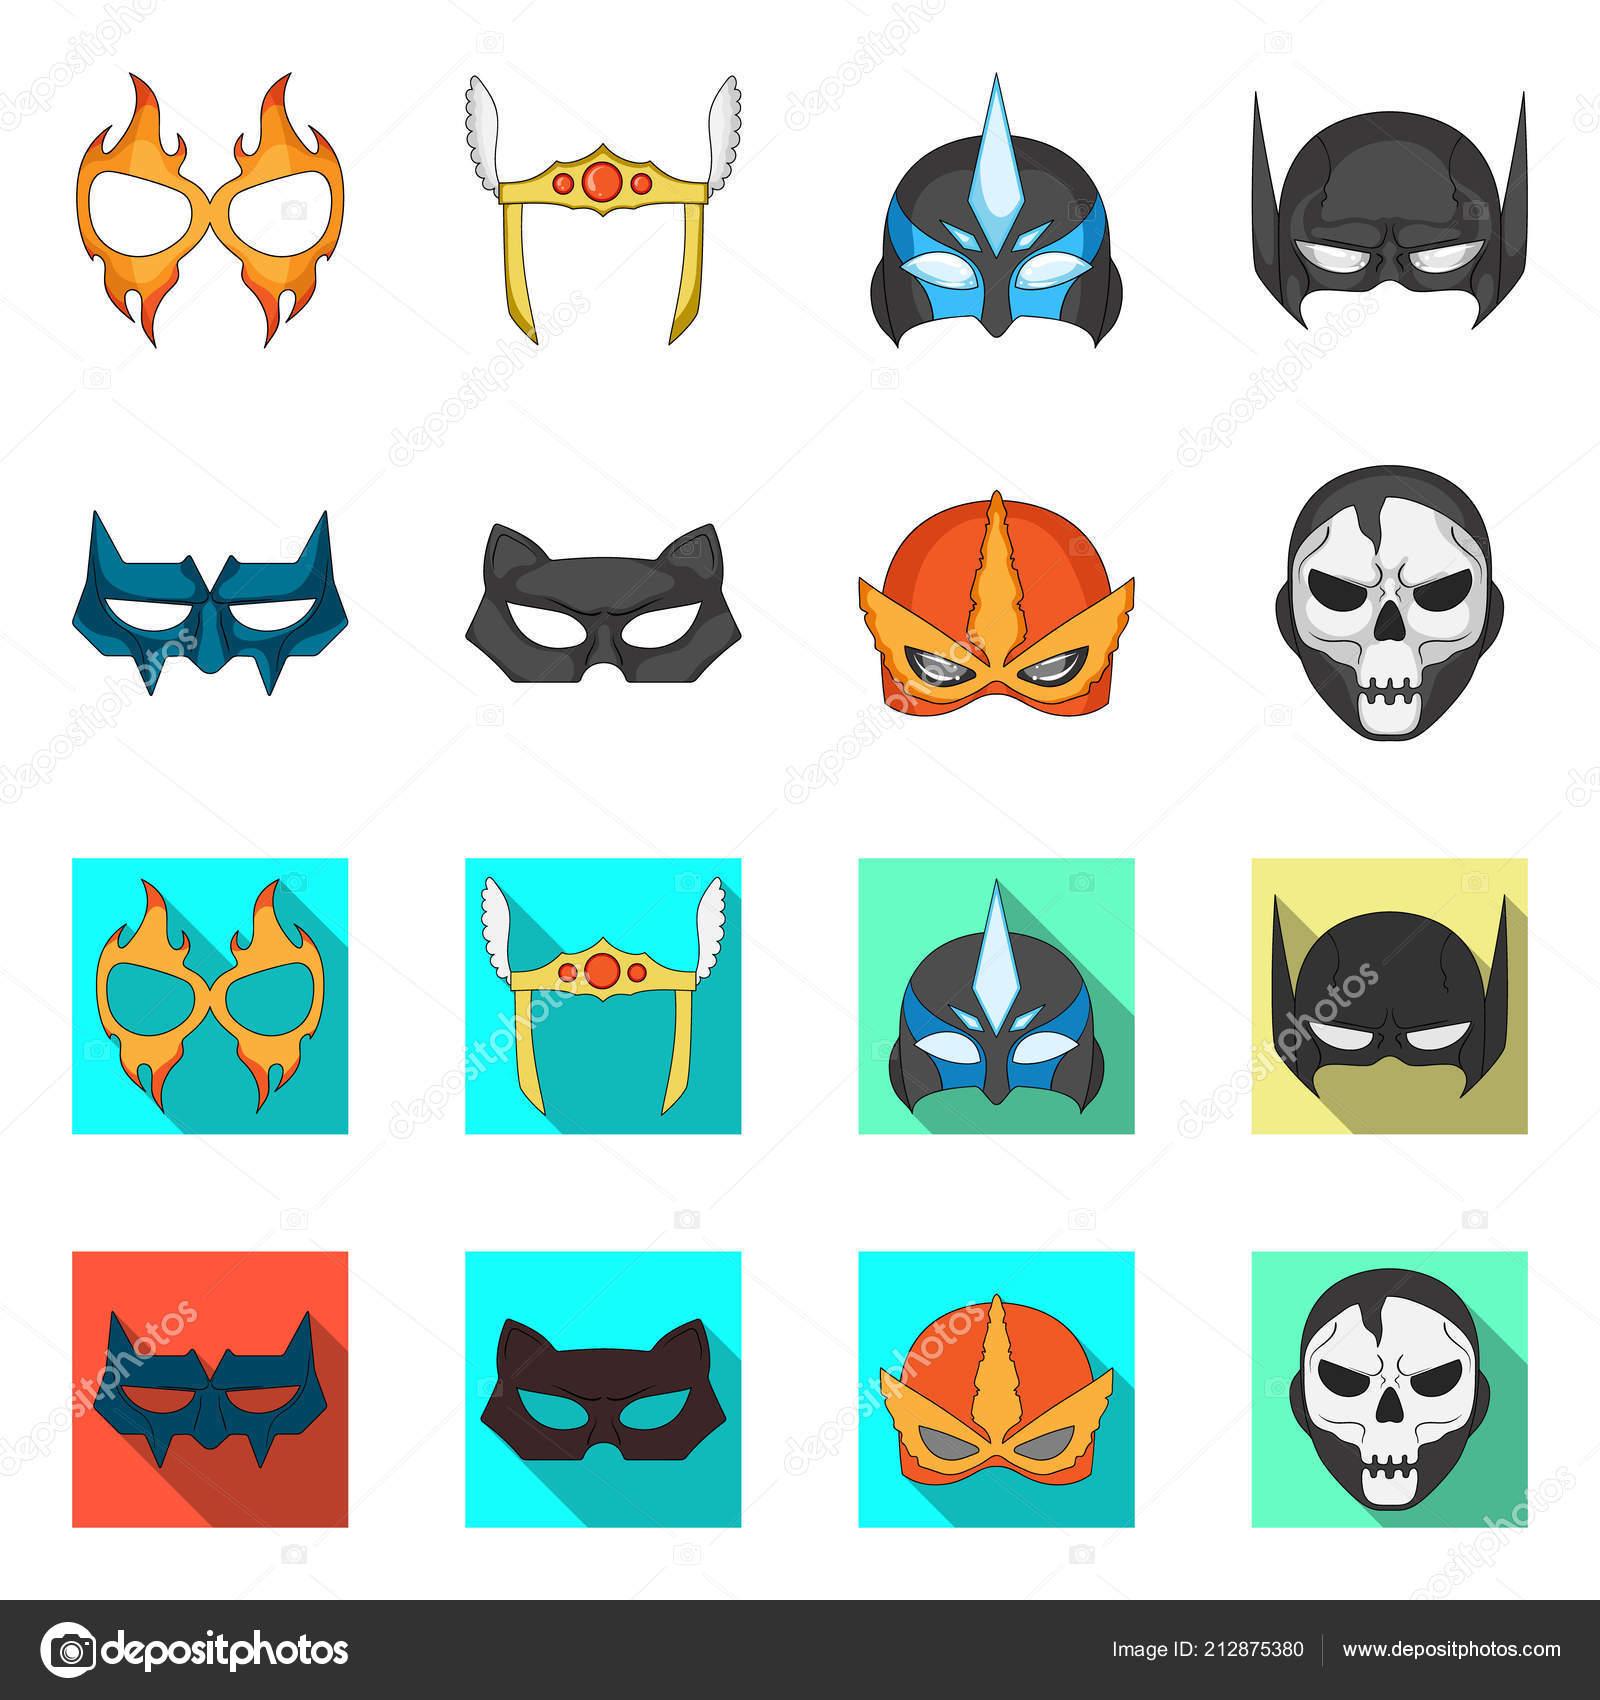 Isolated Object Of Hero And Mask Logo Set Of Hero And Superhero